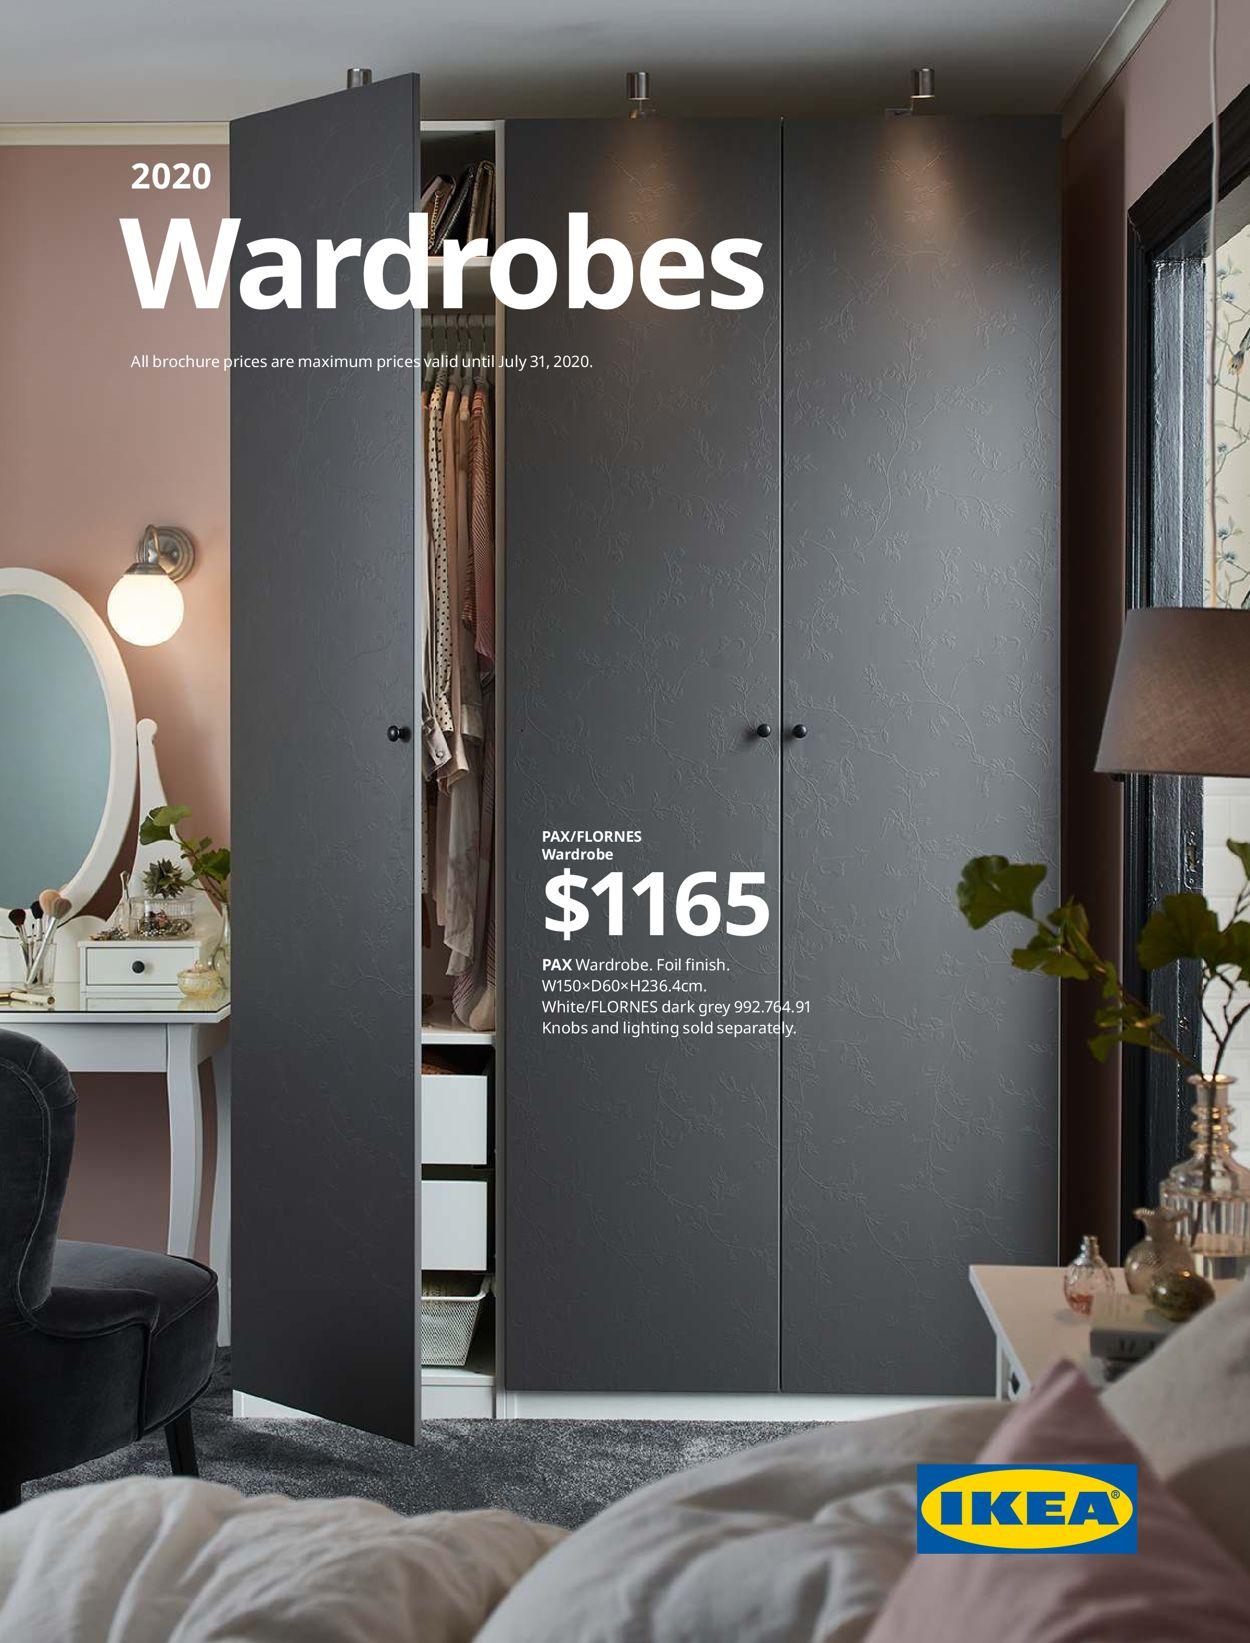 IKEA Flyer - 08/31-07/31/2020